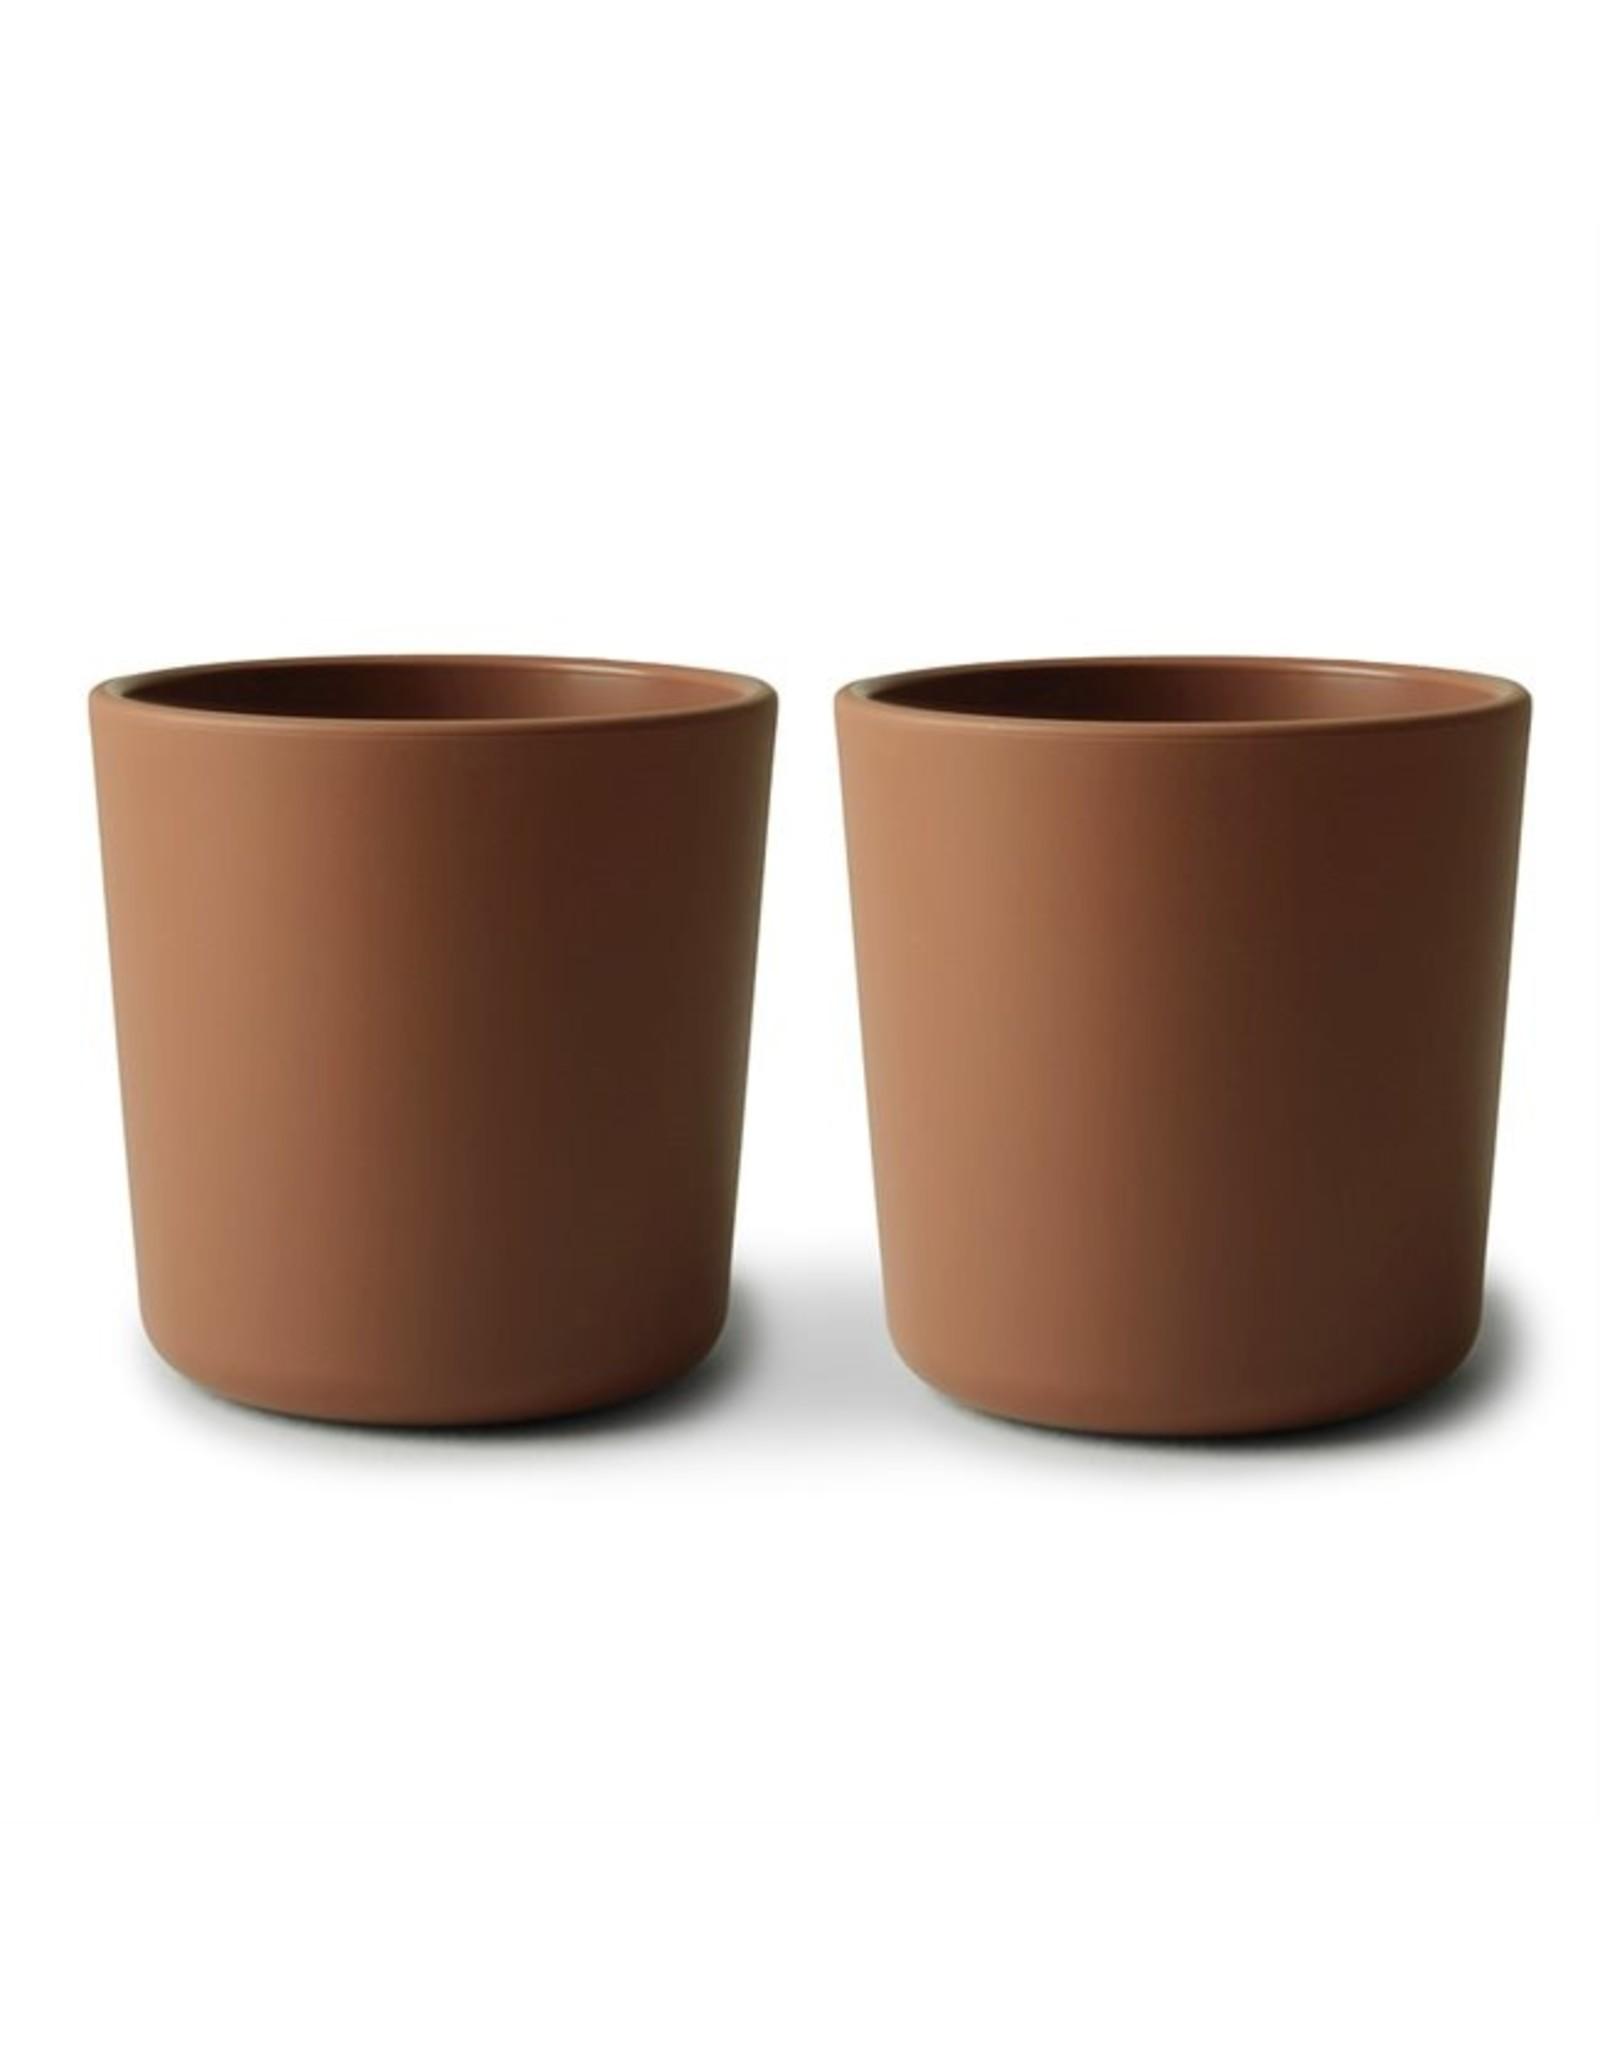 Mushie CUP Caramel (2 PCS)